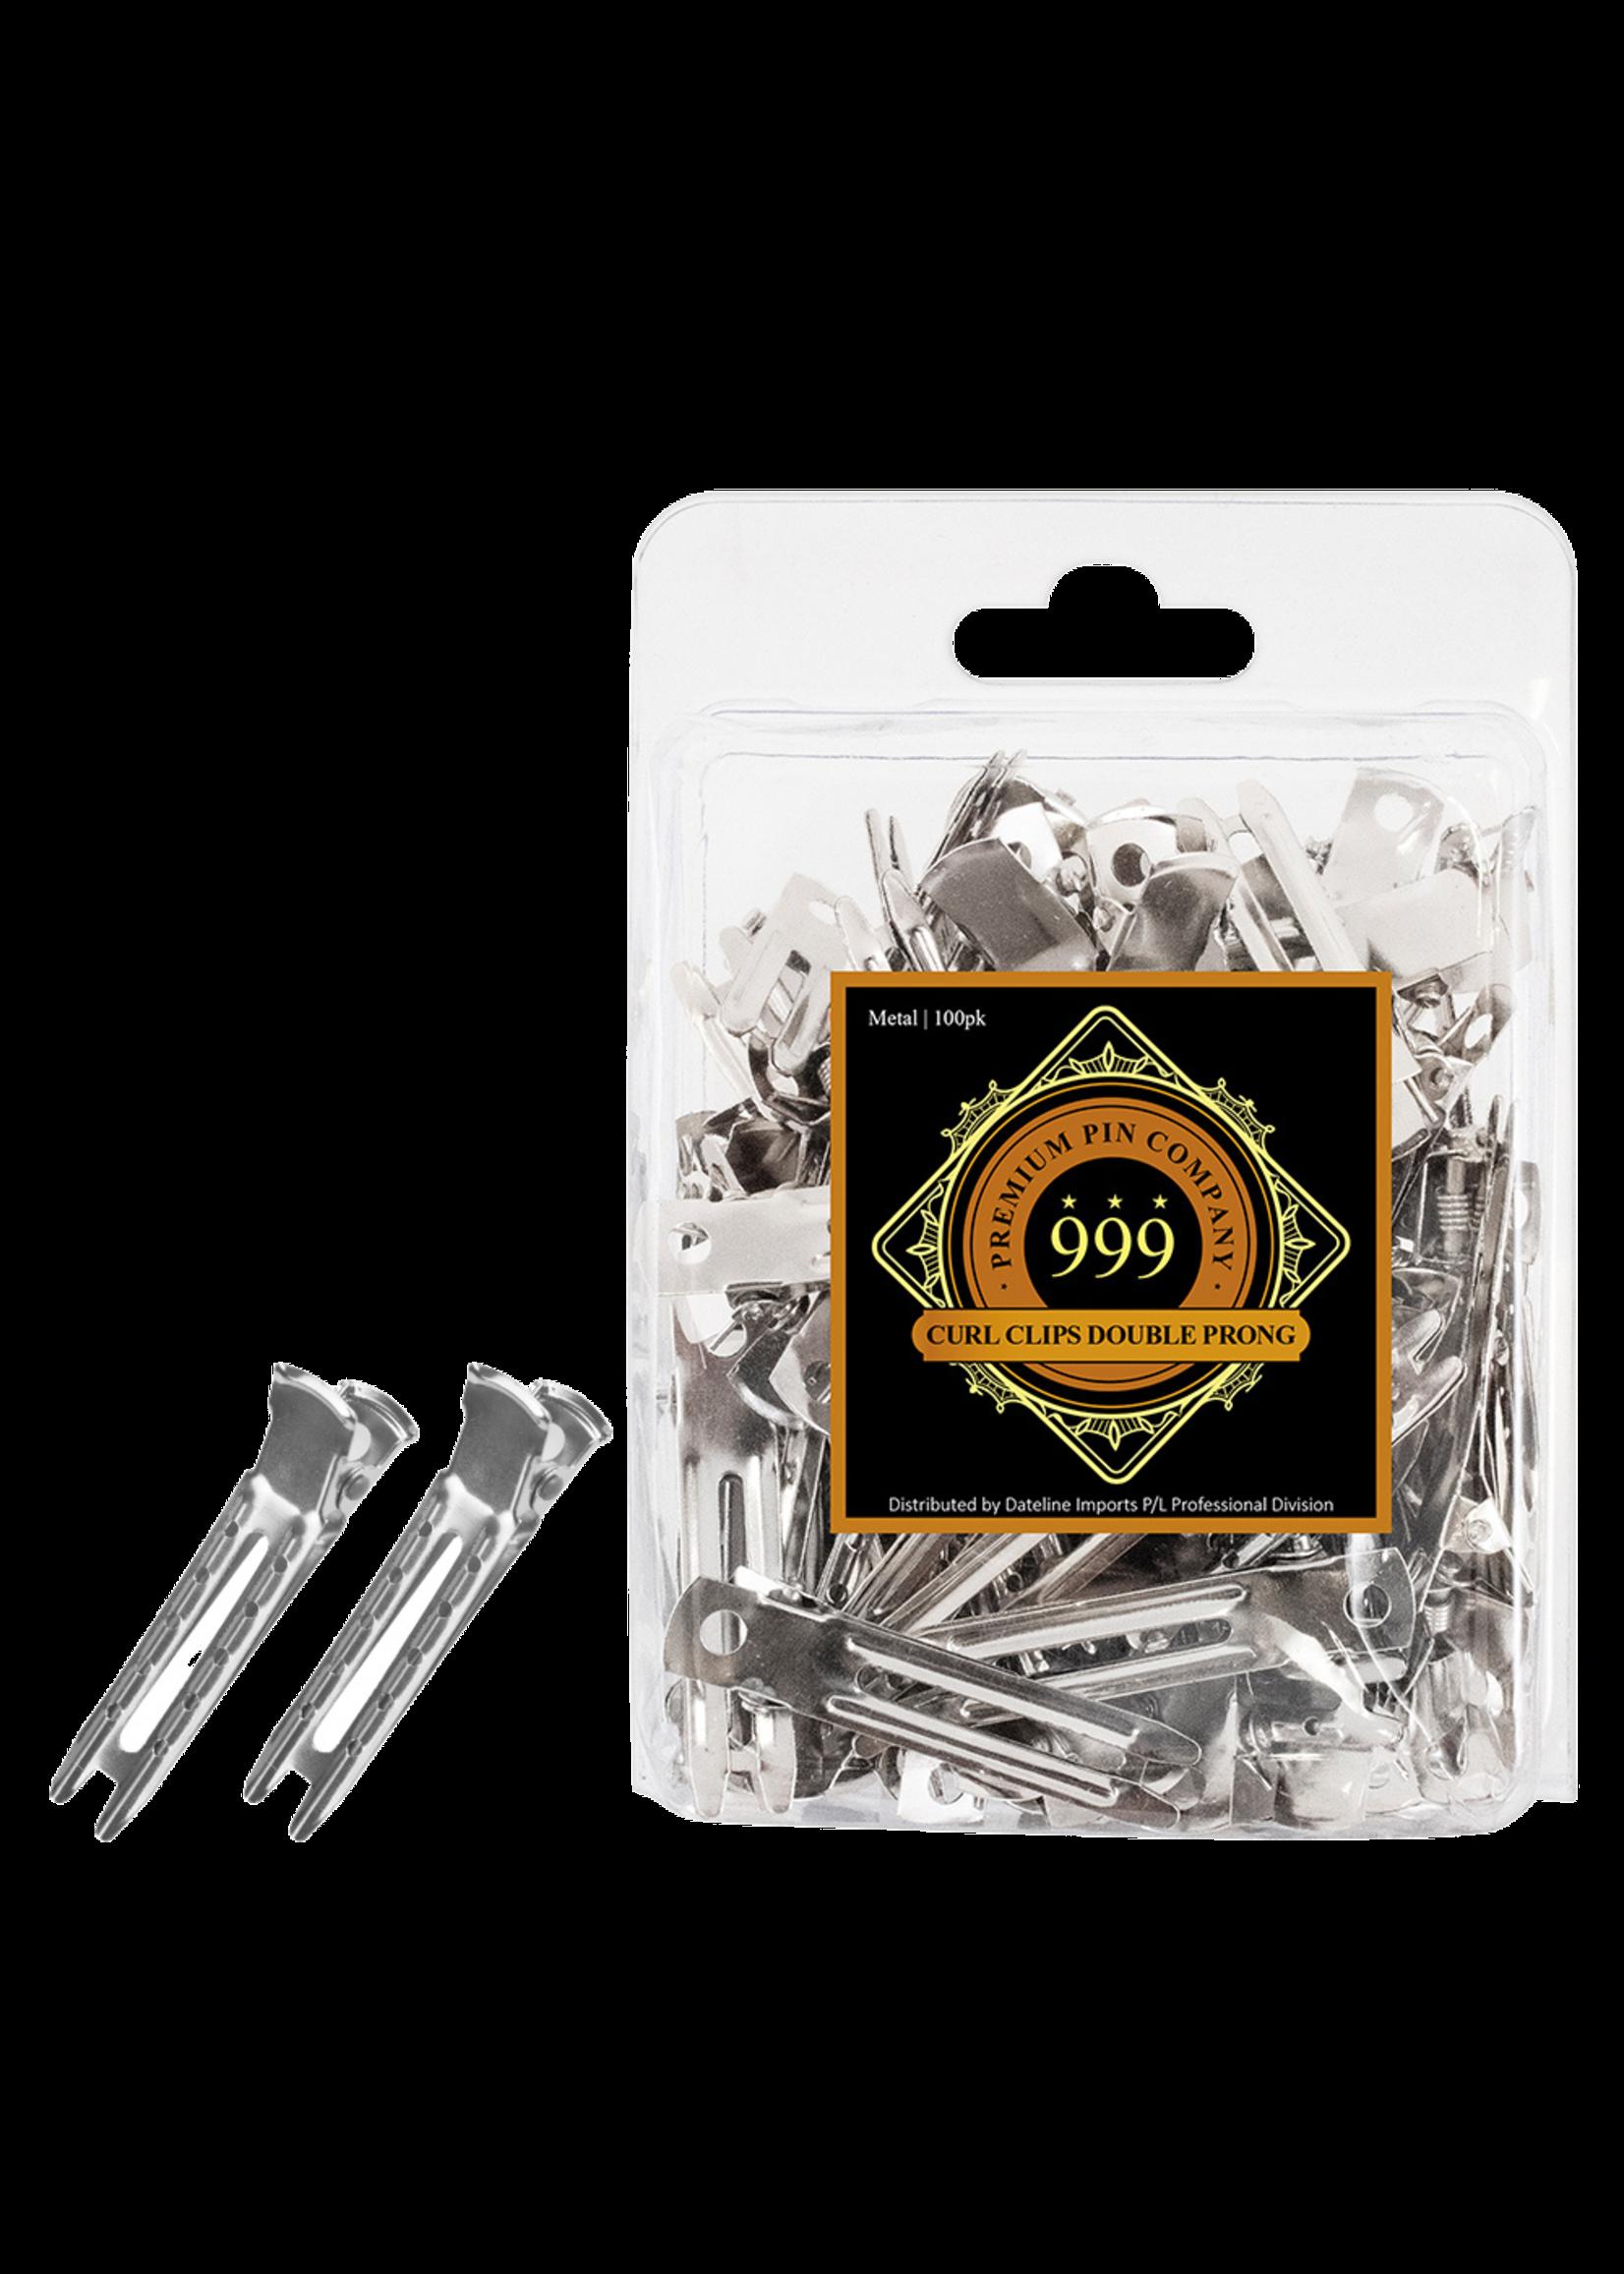 999 Premium Pin Company 999 Curl Clips Double Prong Metal 100pk